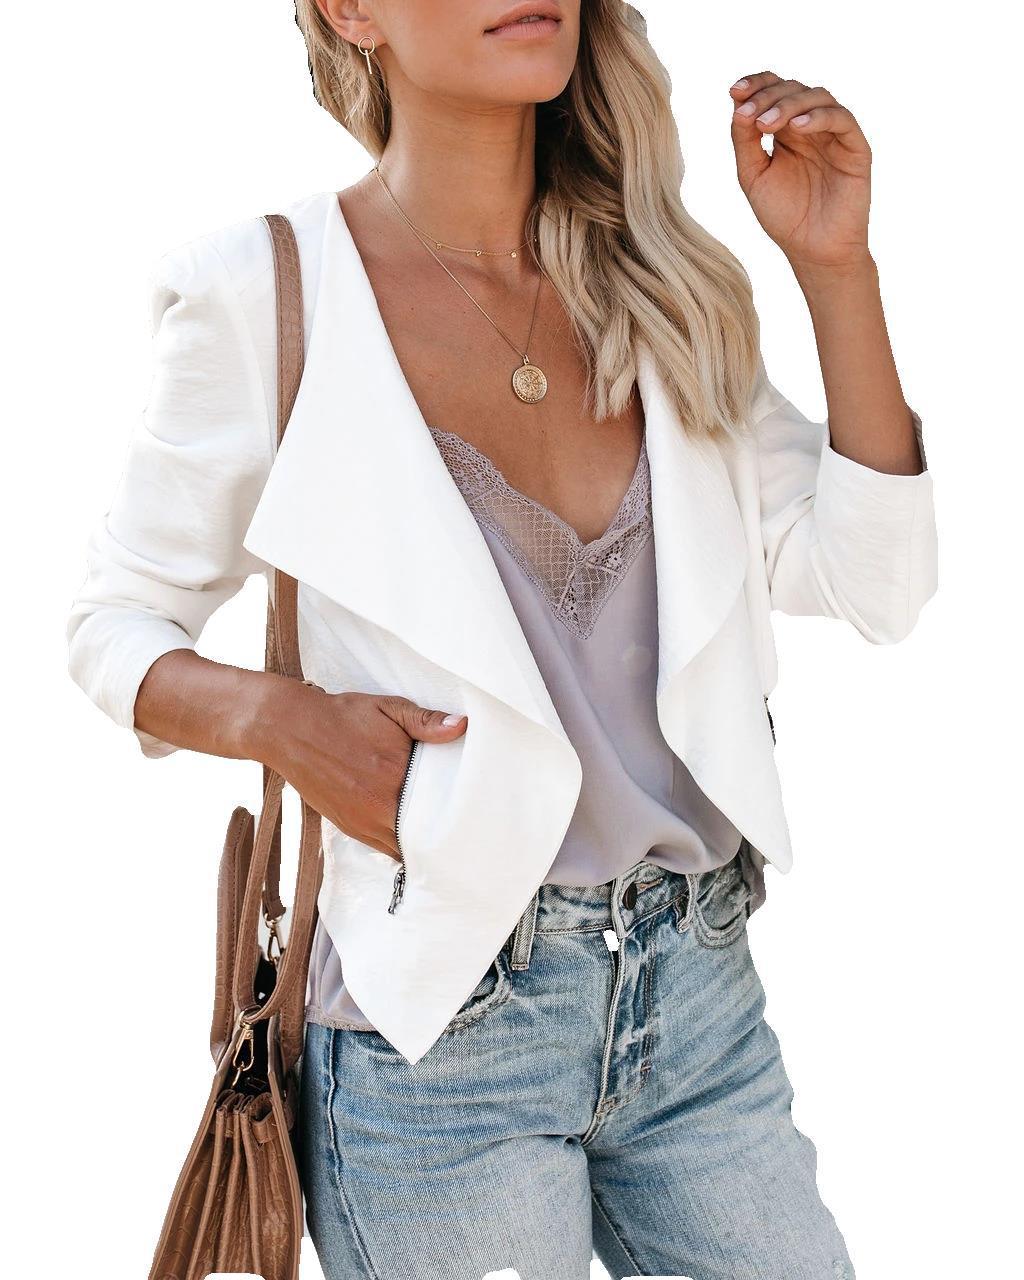 Women Blazer Winter Clothes Gothic Blazers 2019 Harajuku Womens Tops Fall 2018 Casual White Girl Jackets Plus Size